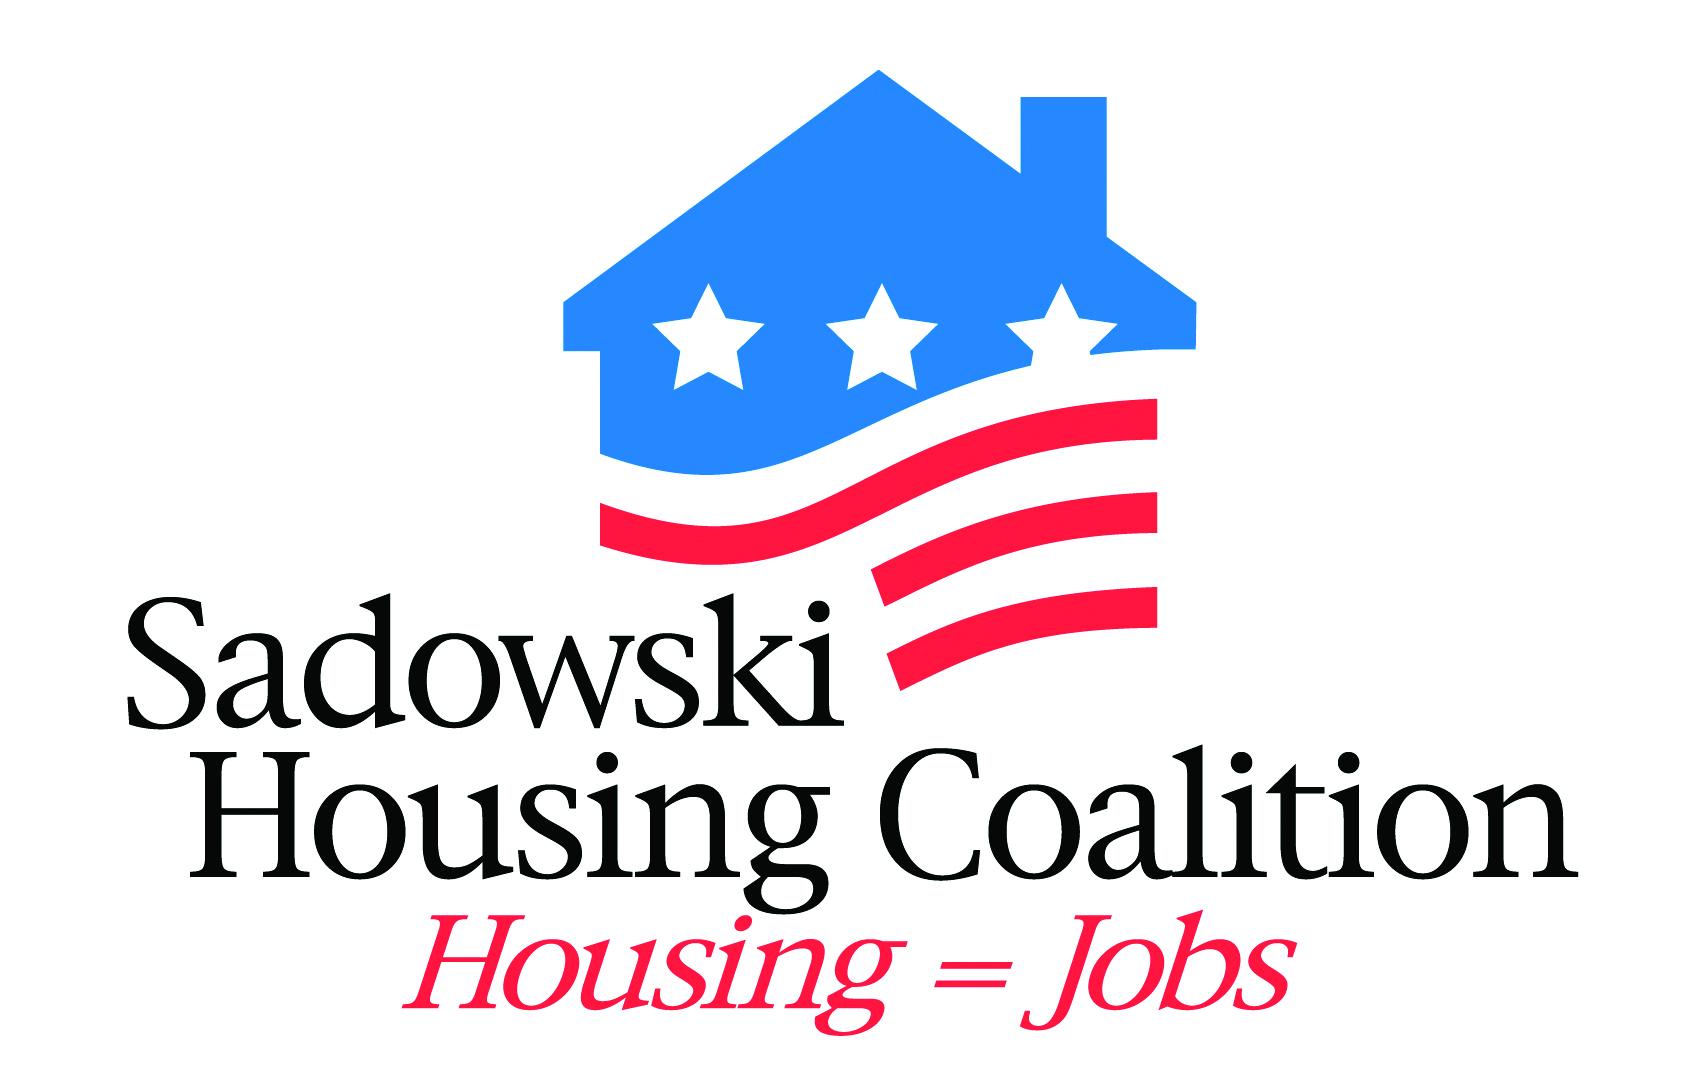 Sadowski Coalition